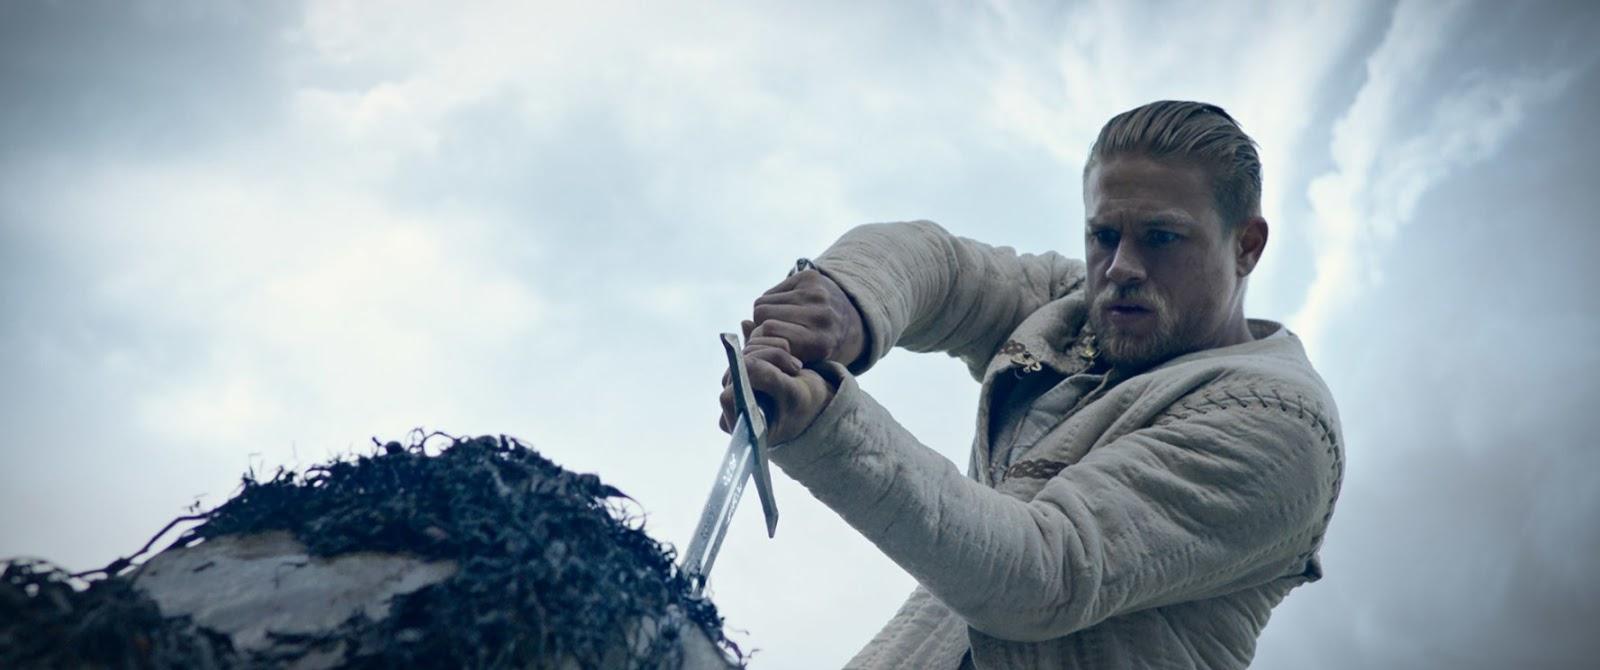 Król Artur: Legenda miecza – Honor, ojczyzna i graffiti